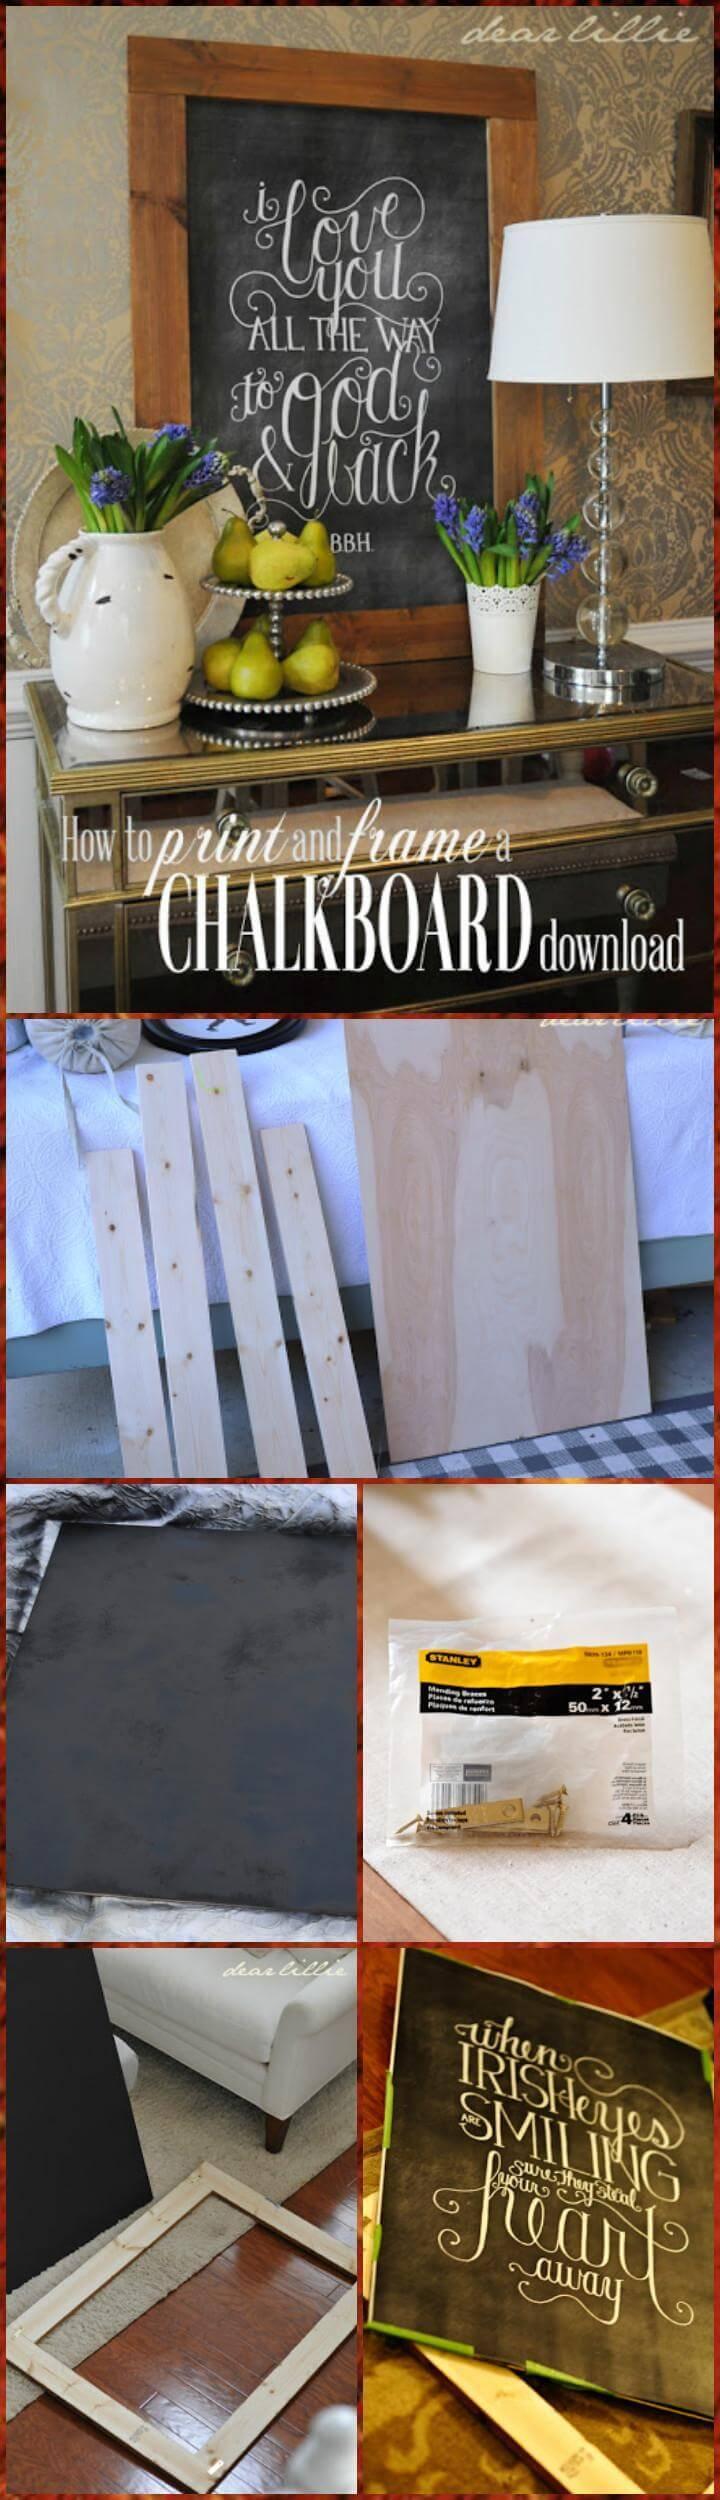 downloading a chalkboard frame tutorial